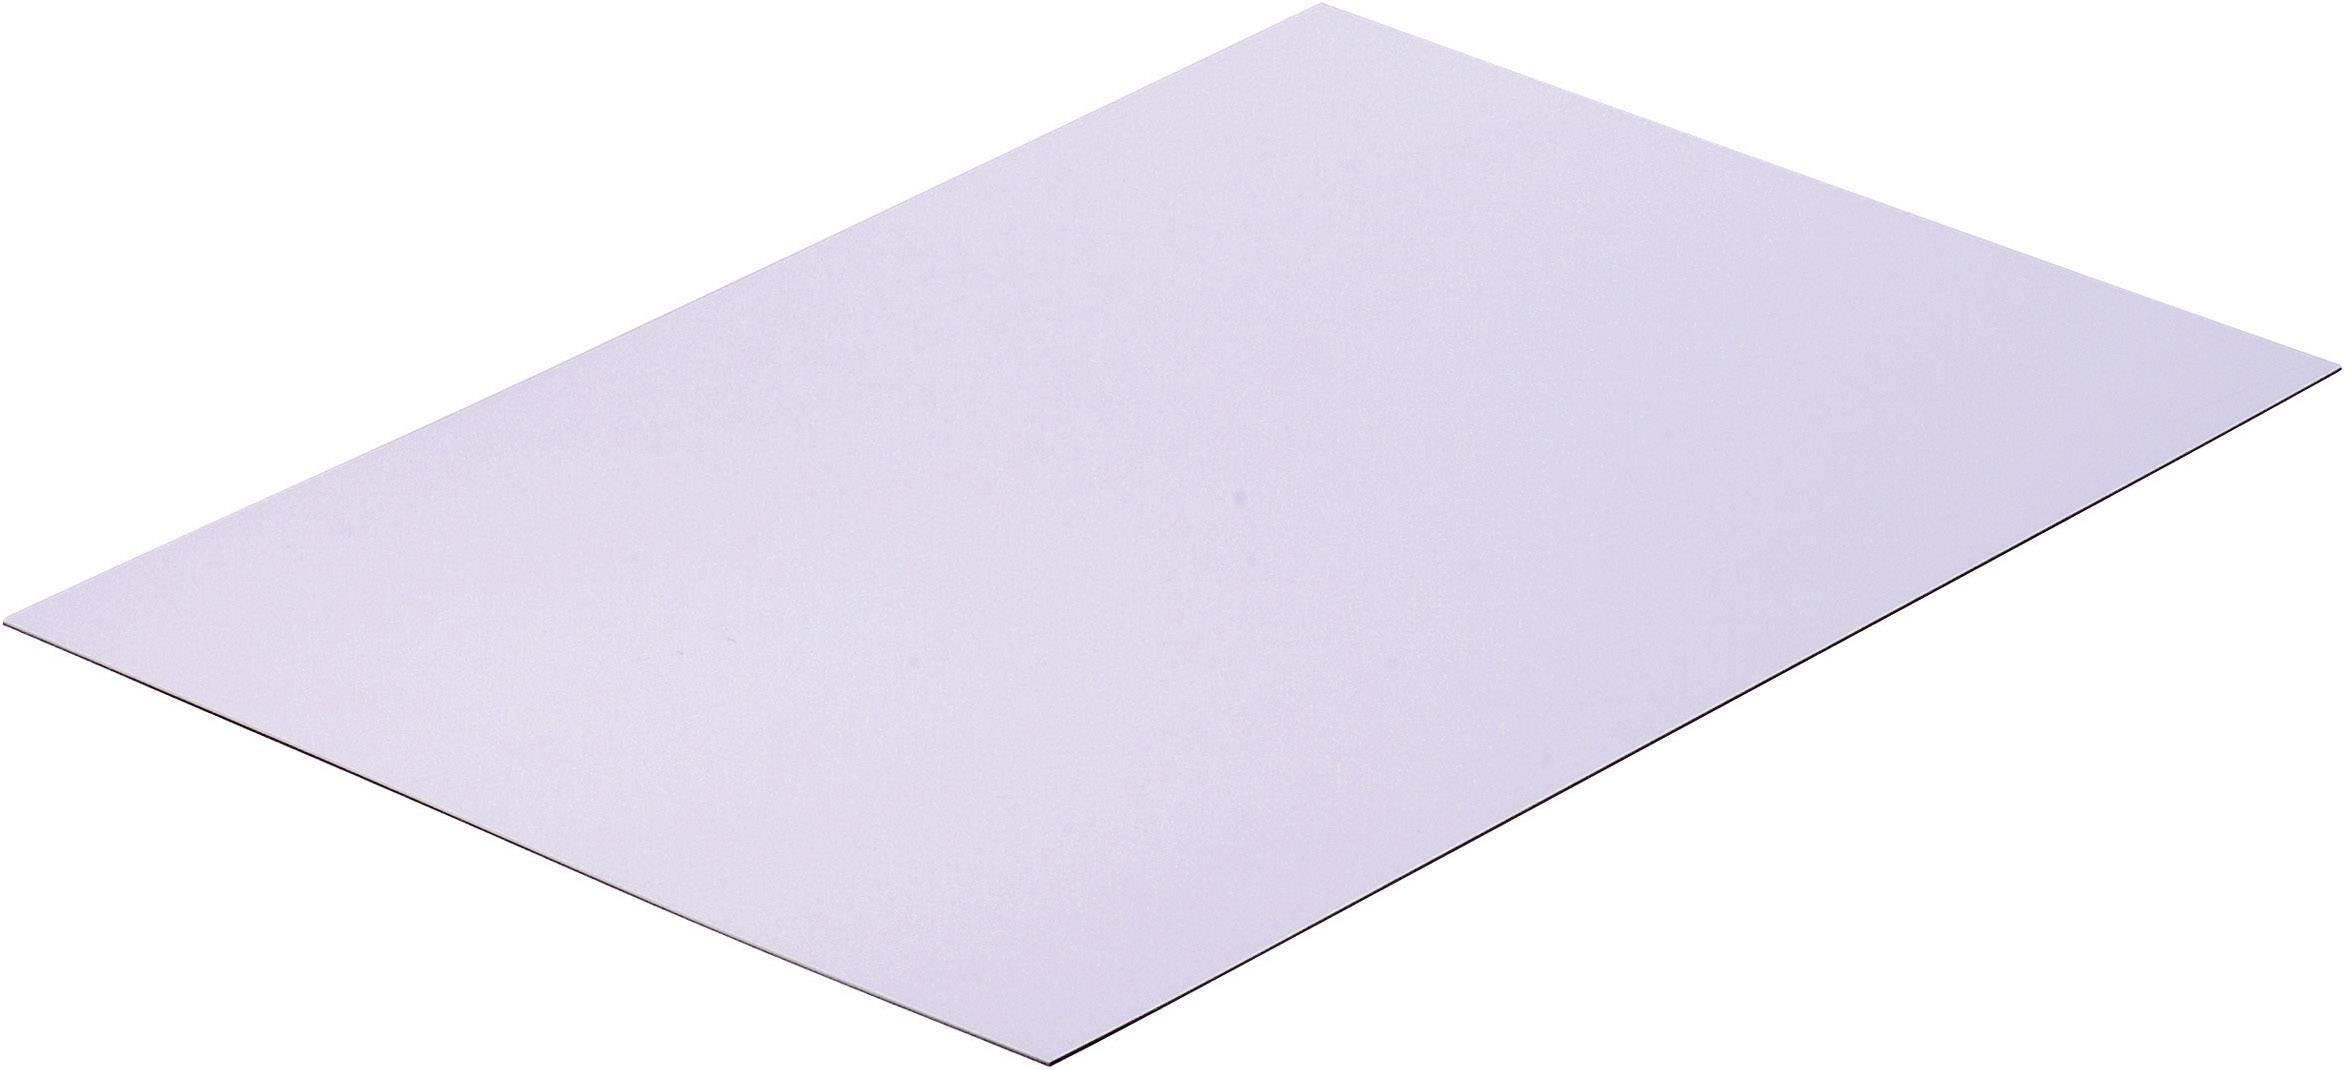 Polystyrenová deska bílá Modelcraft, 330 x 230 x 2 mm